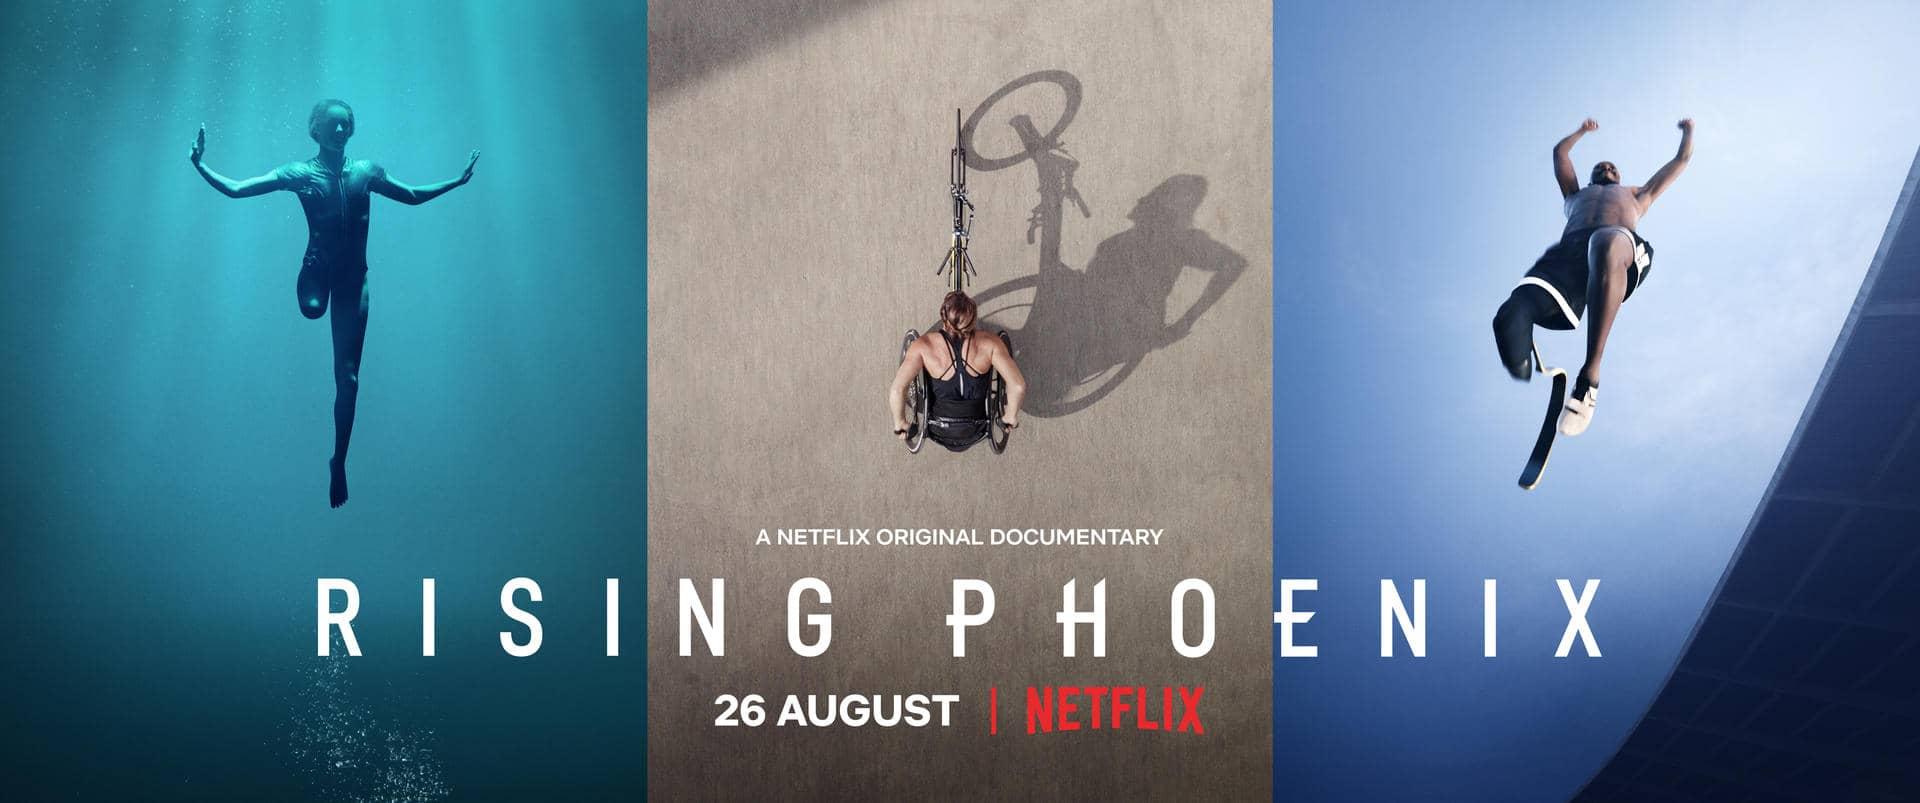 Rising Phoenix: trama, cast, trailer, data uscita su Netflix